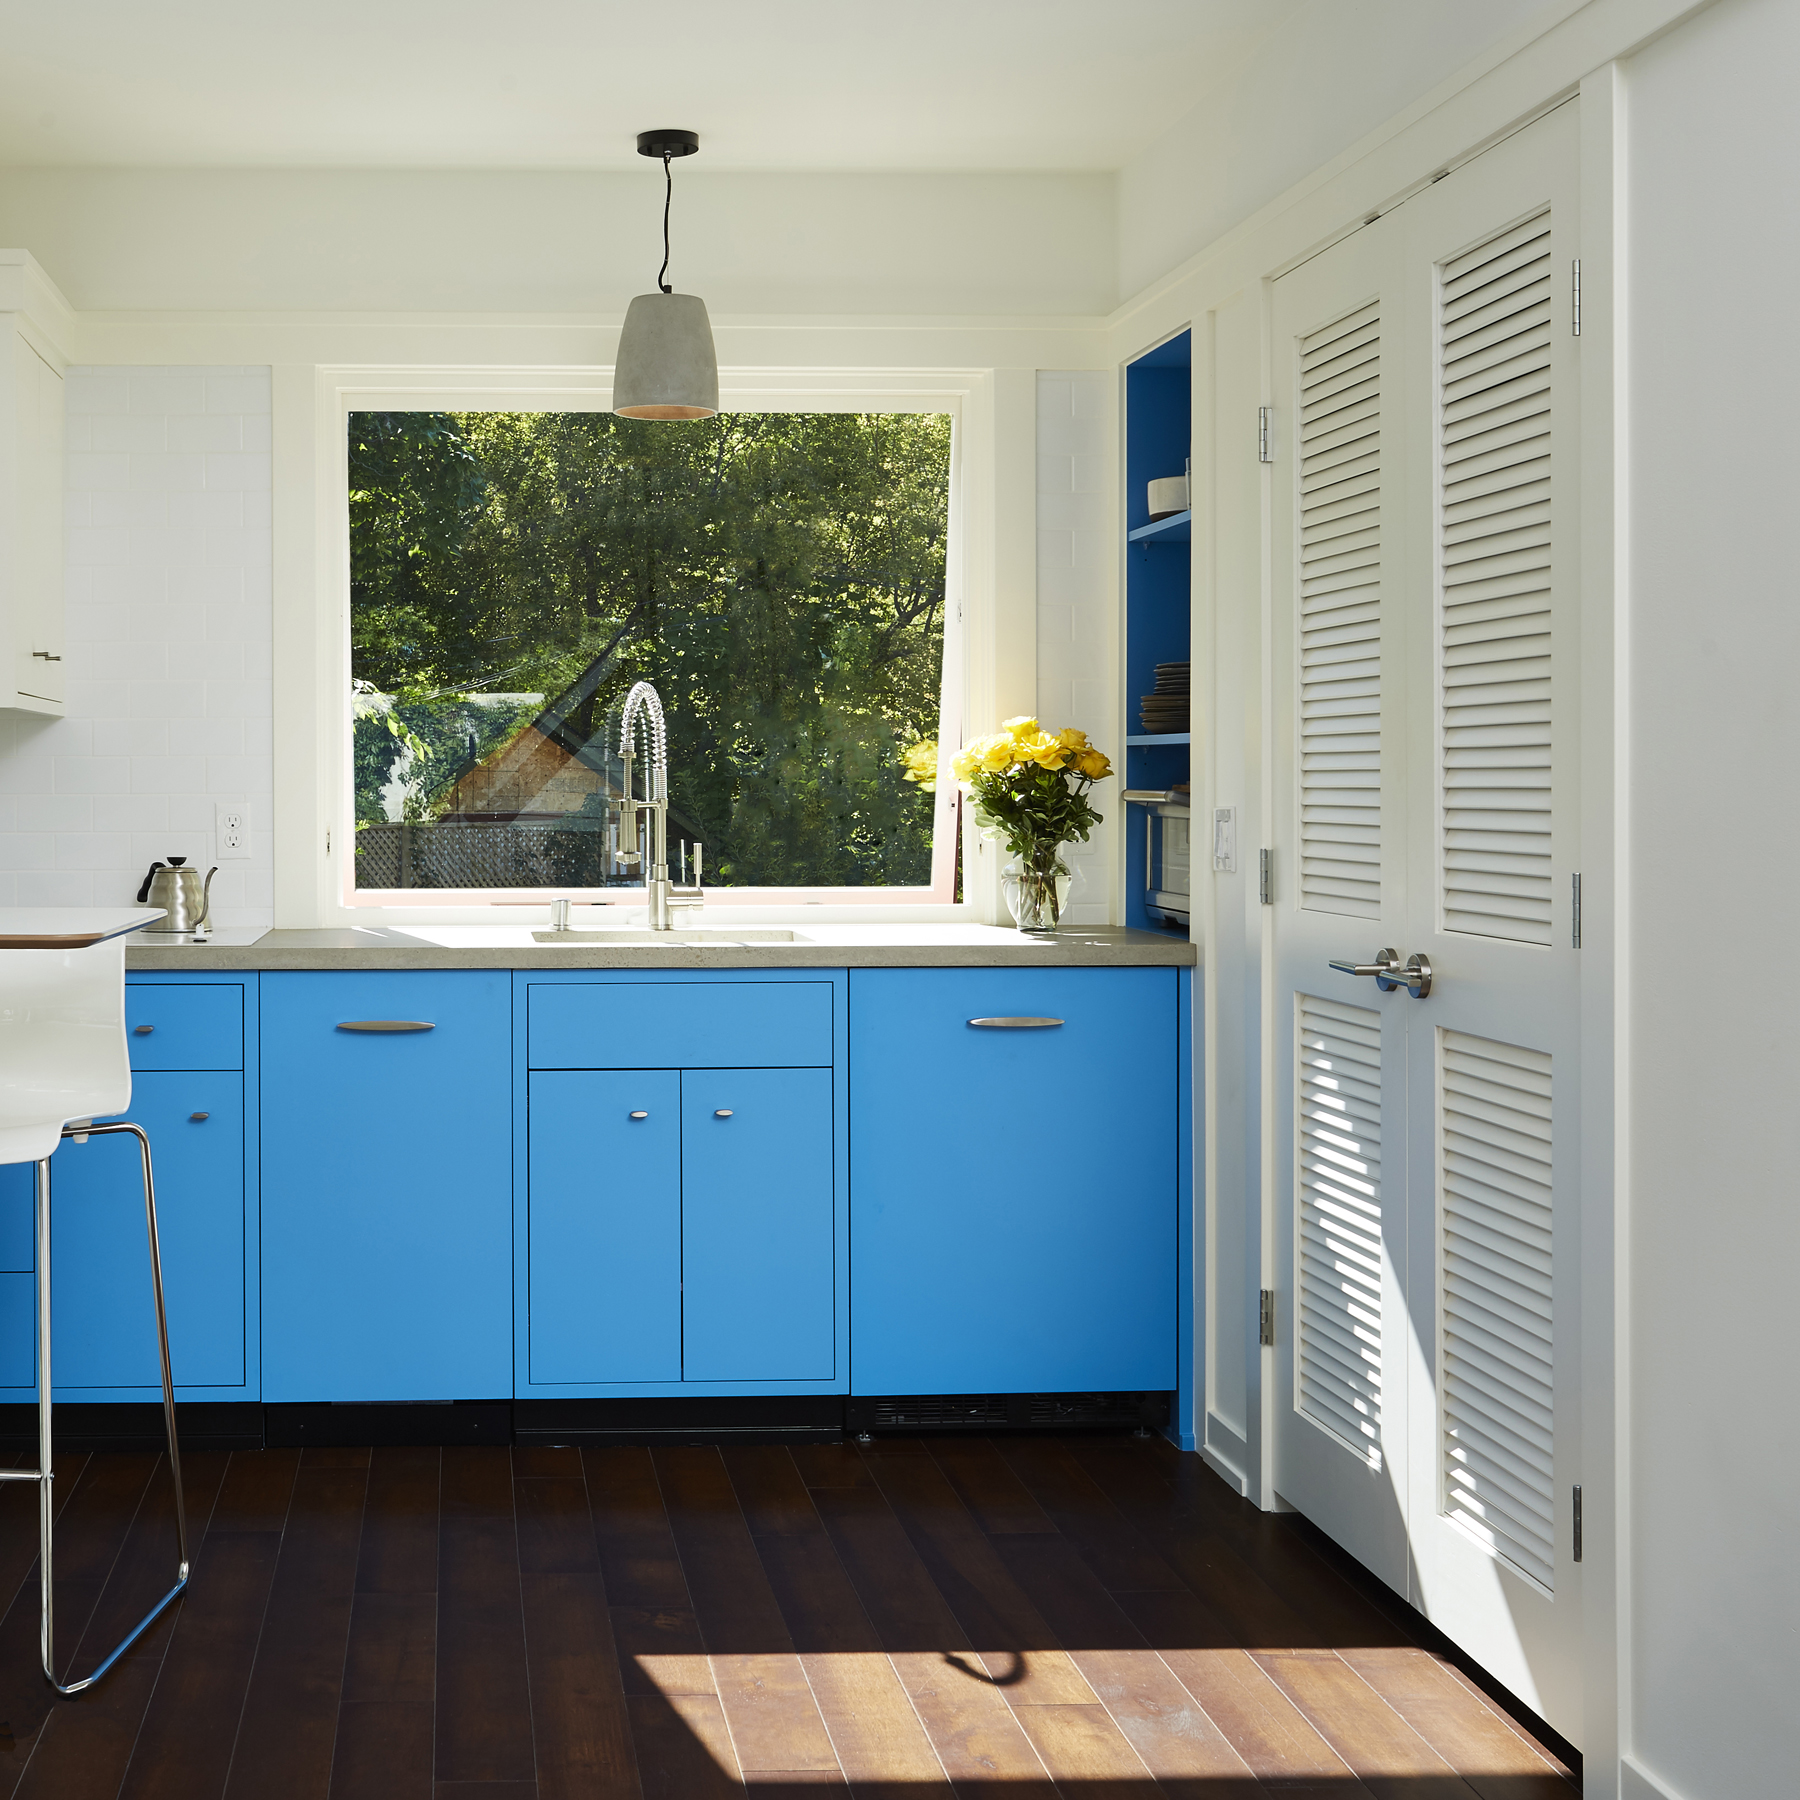 2769-Compact Living Interior Kitchen-2.jpg